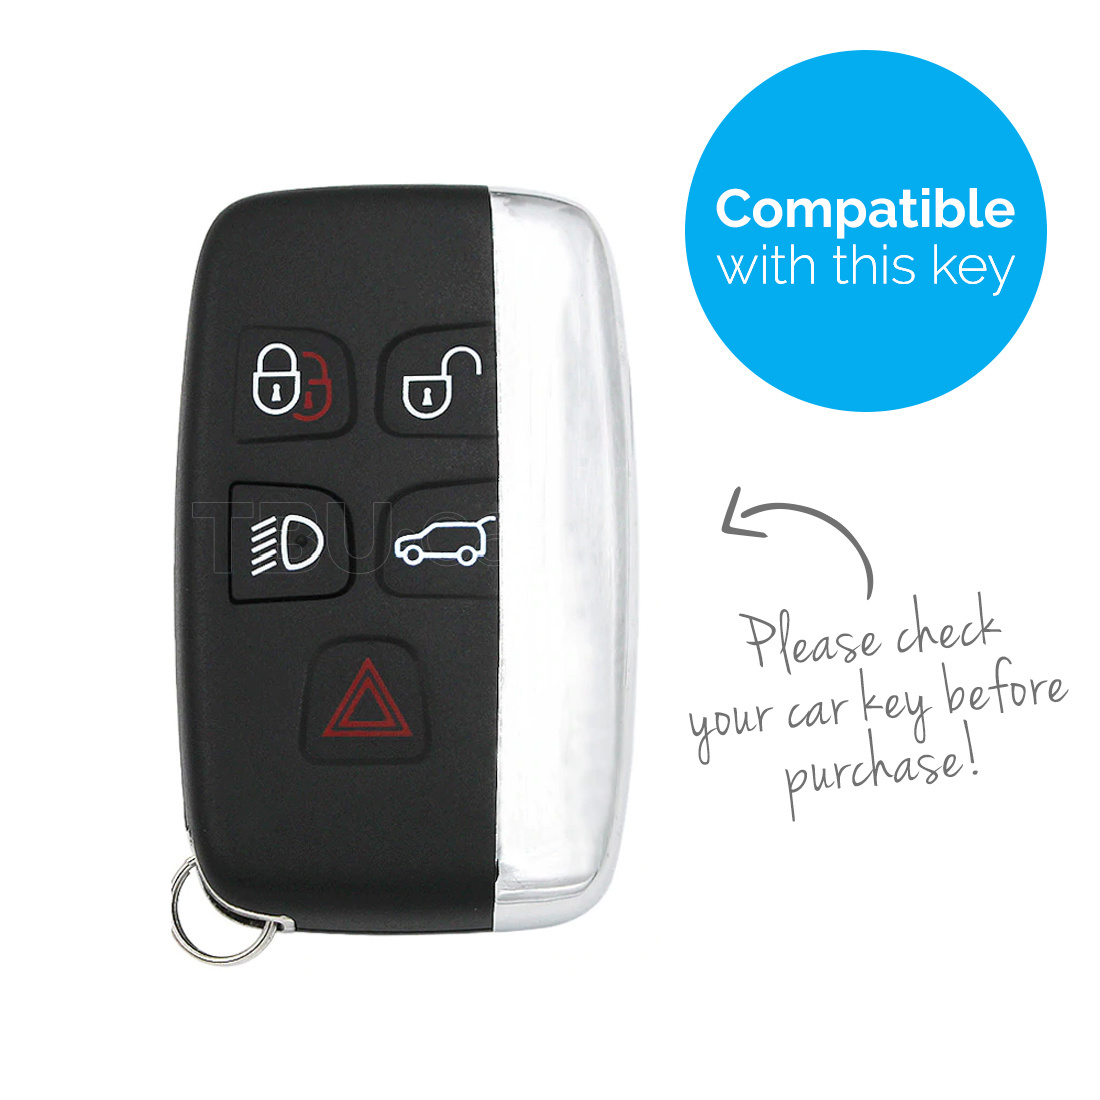 TBU car TBU car Sleutel cover compatibel met Range Rover - Silicone sleutelhoesje - beschermhoesje autosleutel - Roze